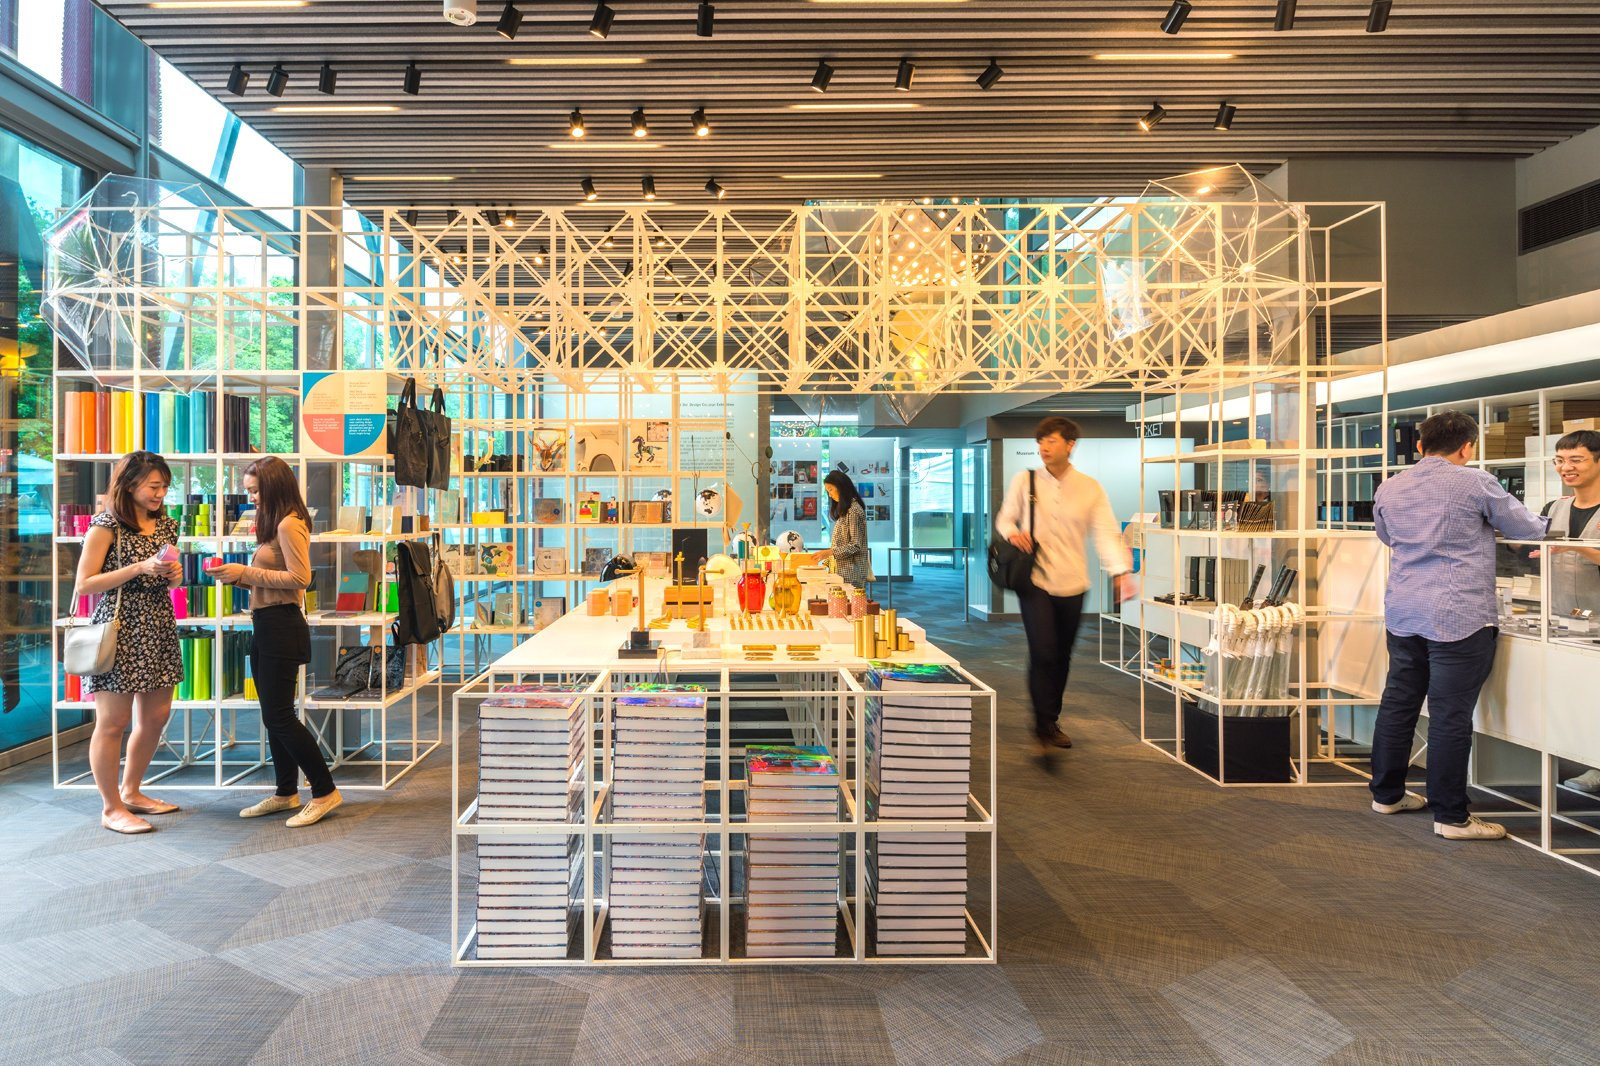 Red Dot Design Museum in Singapore - Innovative Design